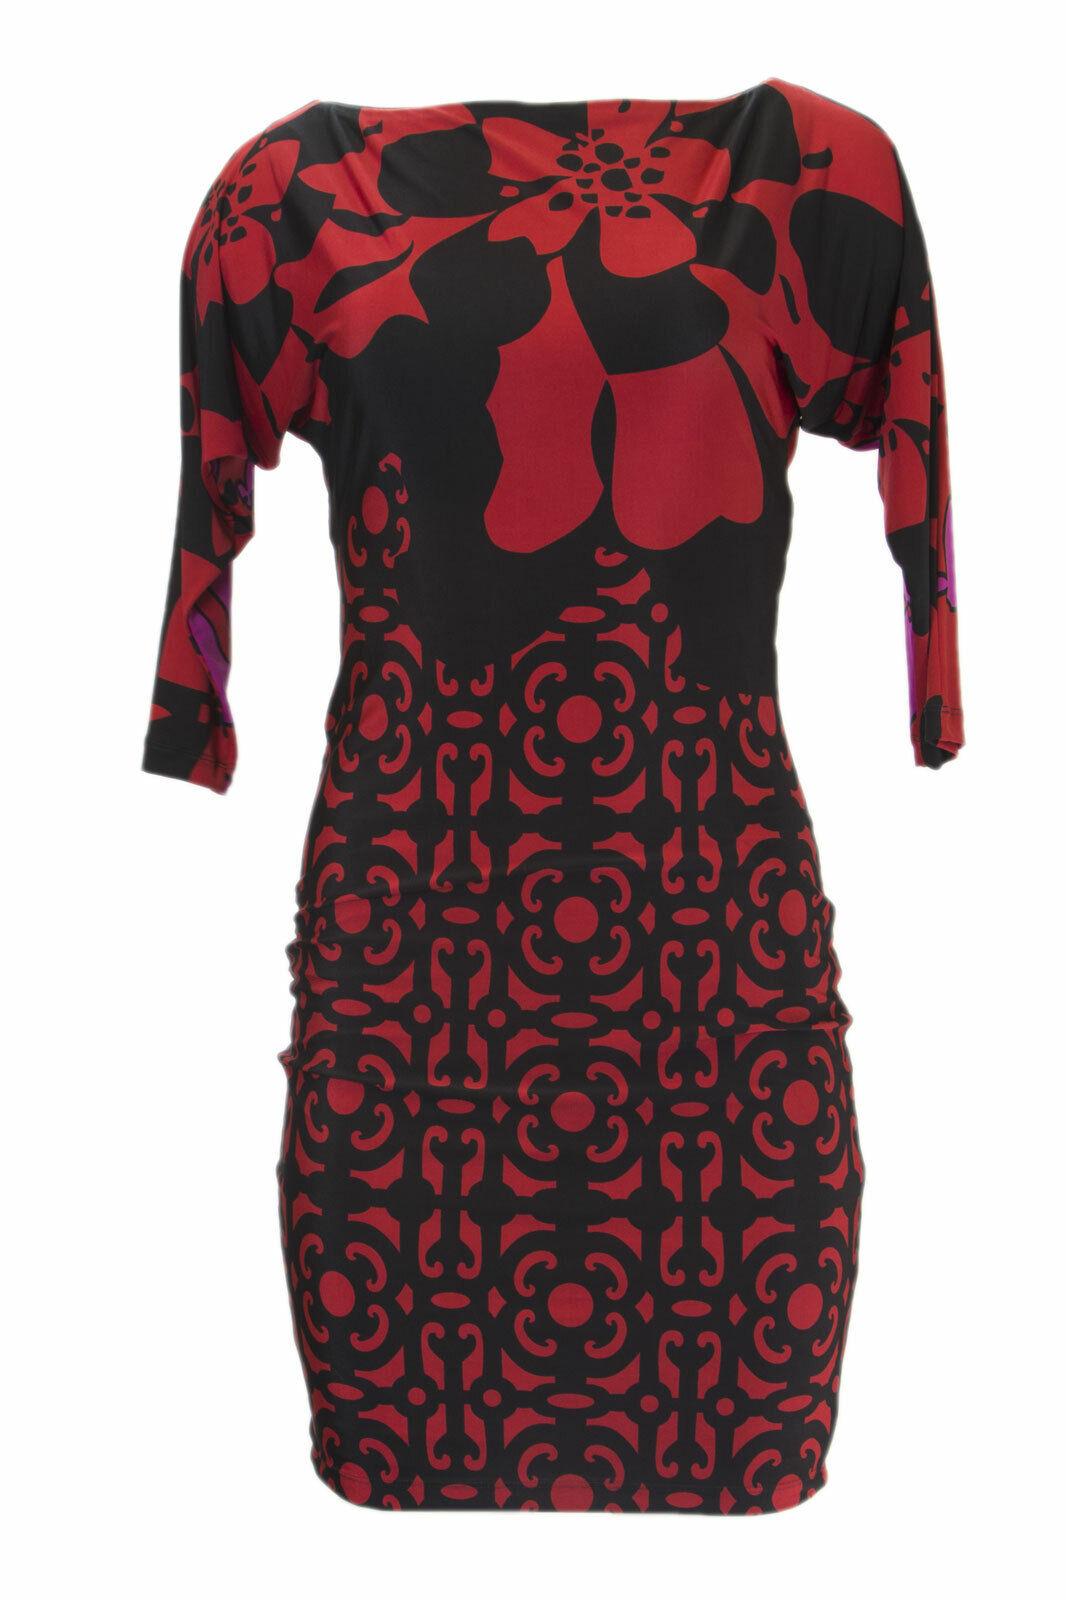 ANALILI Woherren schwarz Arabesque Print Cut Out  Back Dress A1363BD10 M  NEW